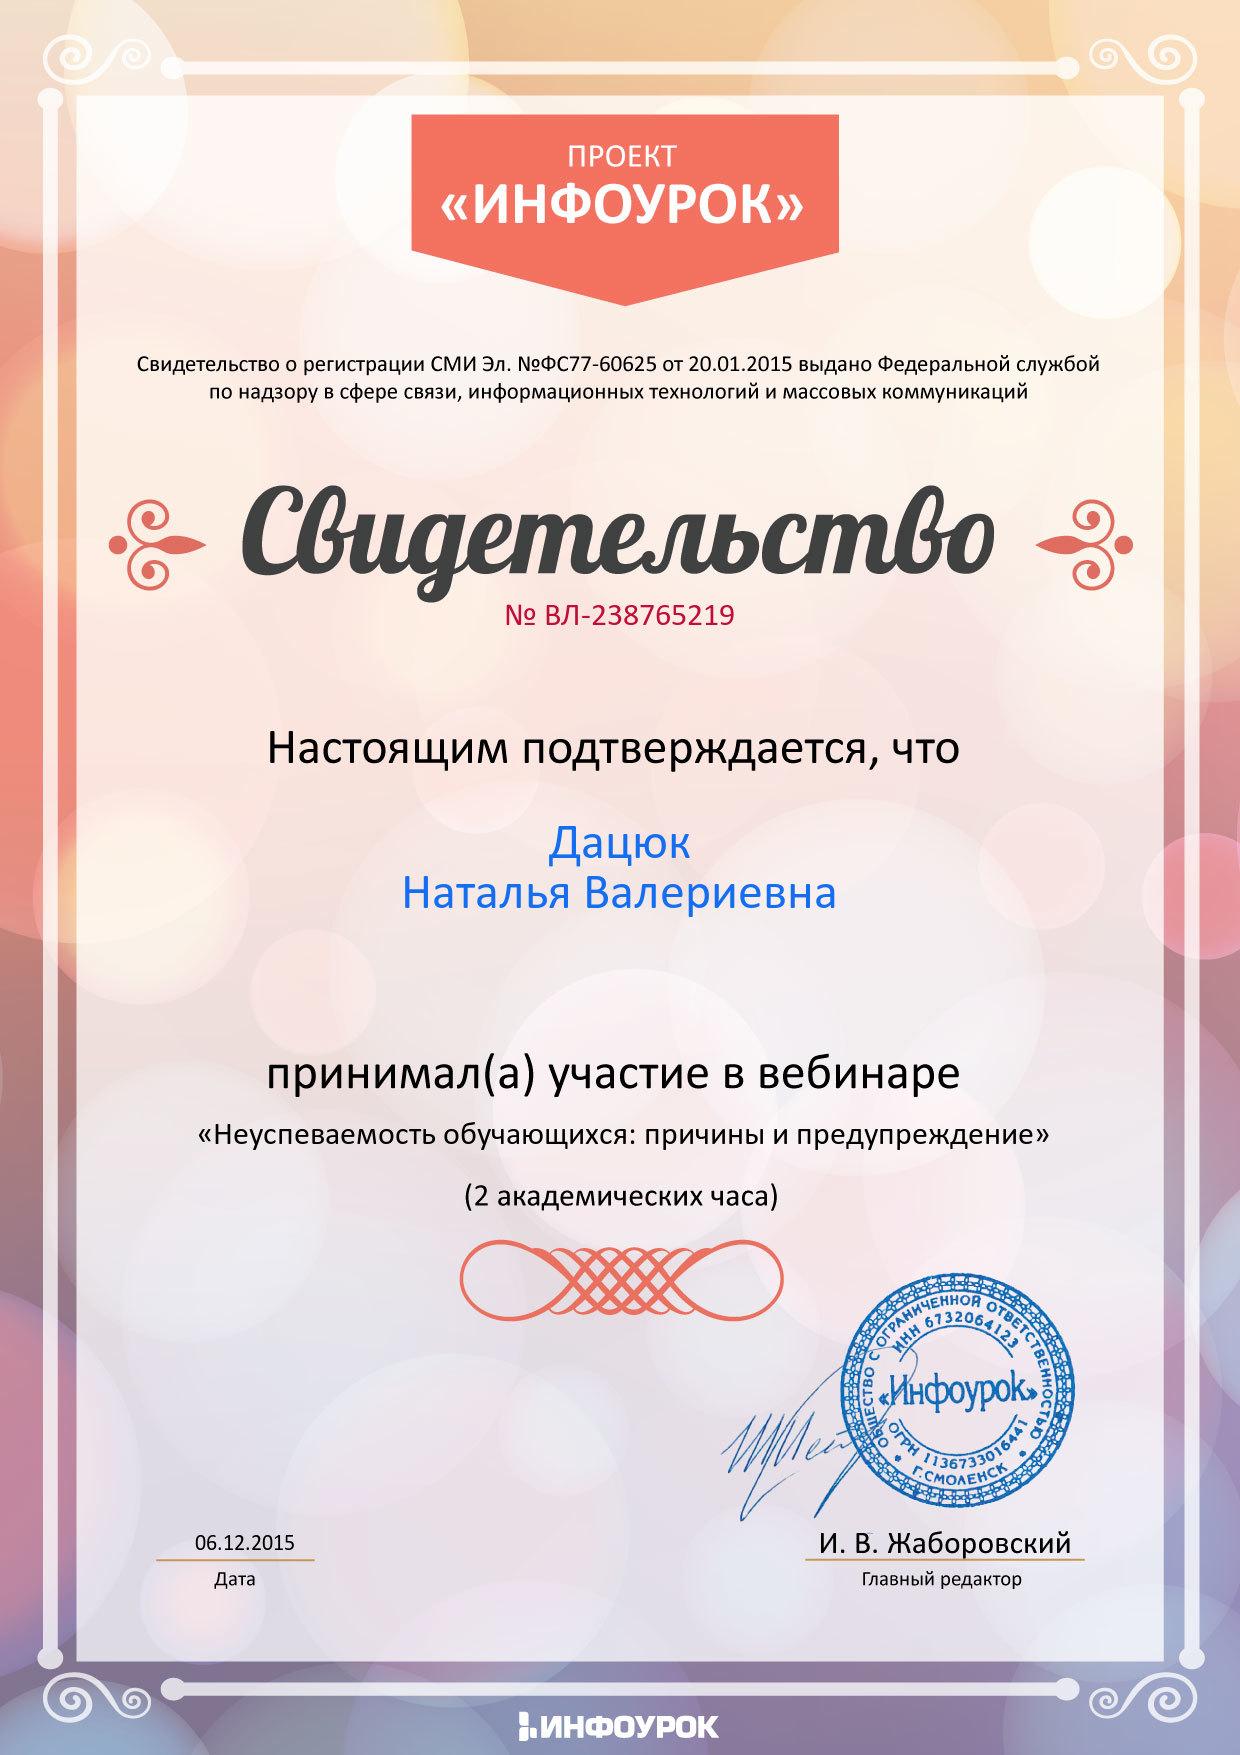 C:\Users\COMPP\Downloads\Свидетельство проекта infourok.ru № ВЛ-238765219.jpg